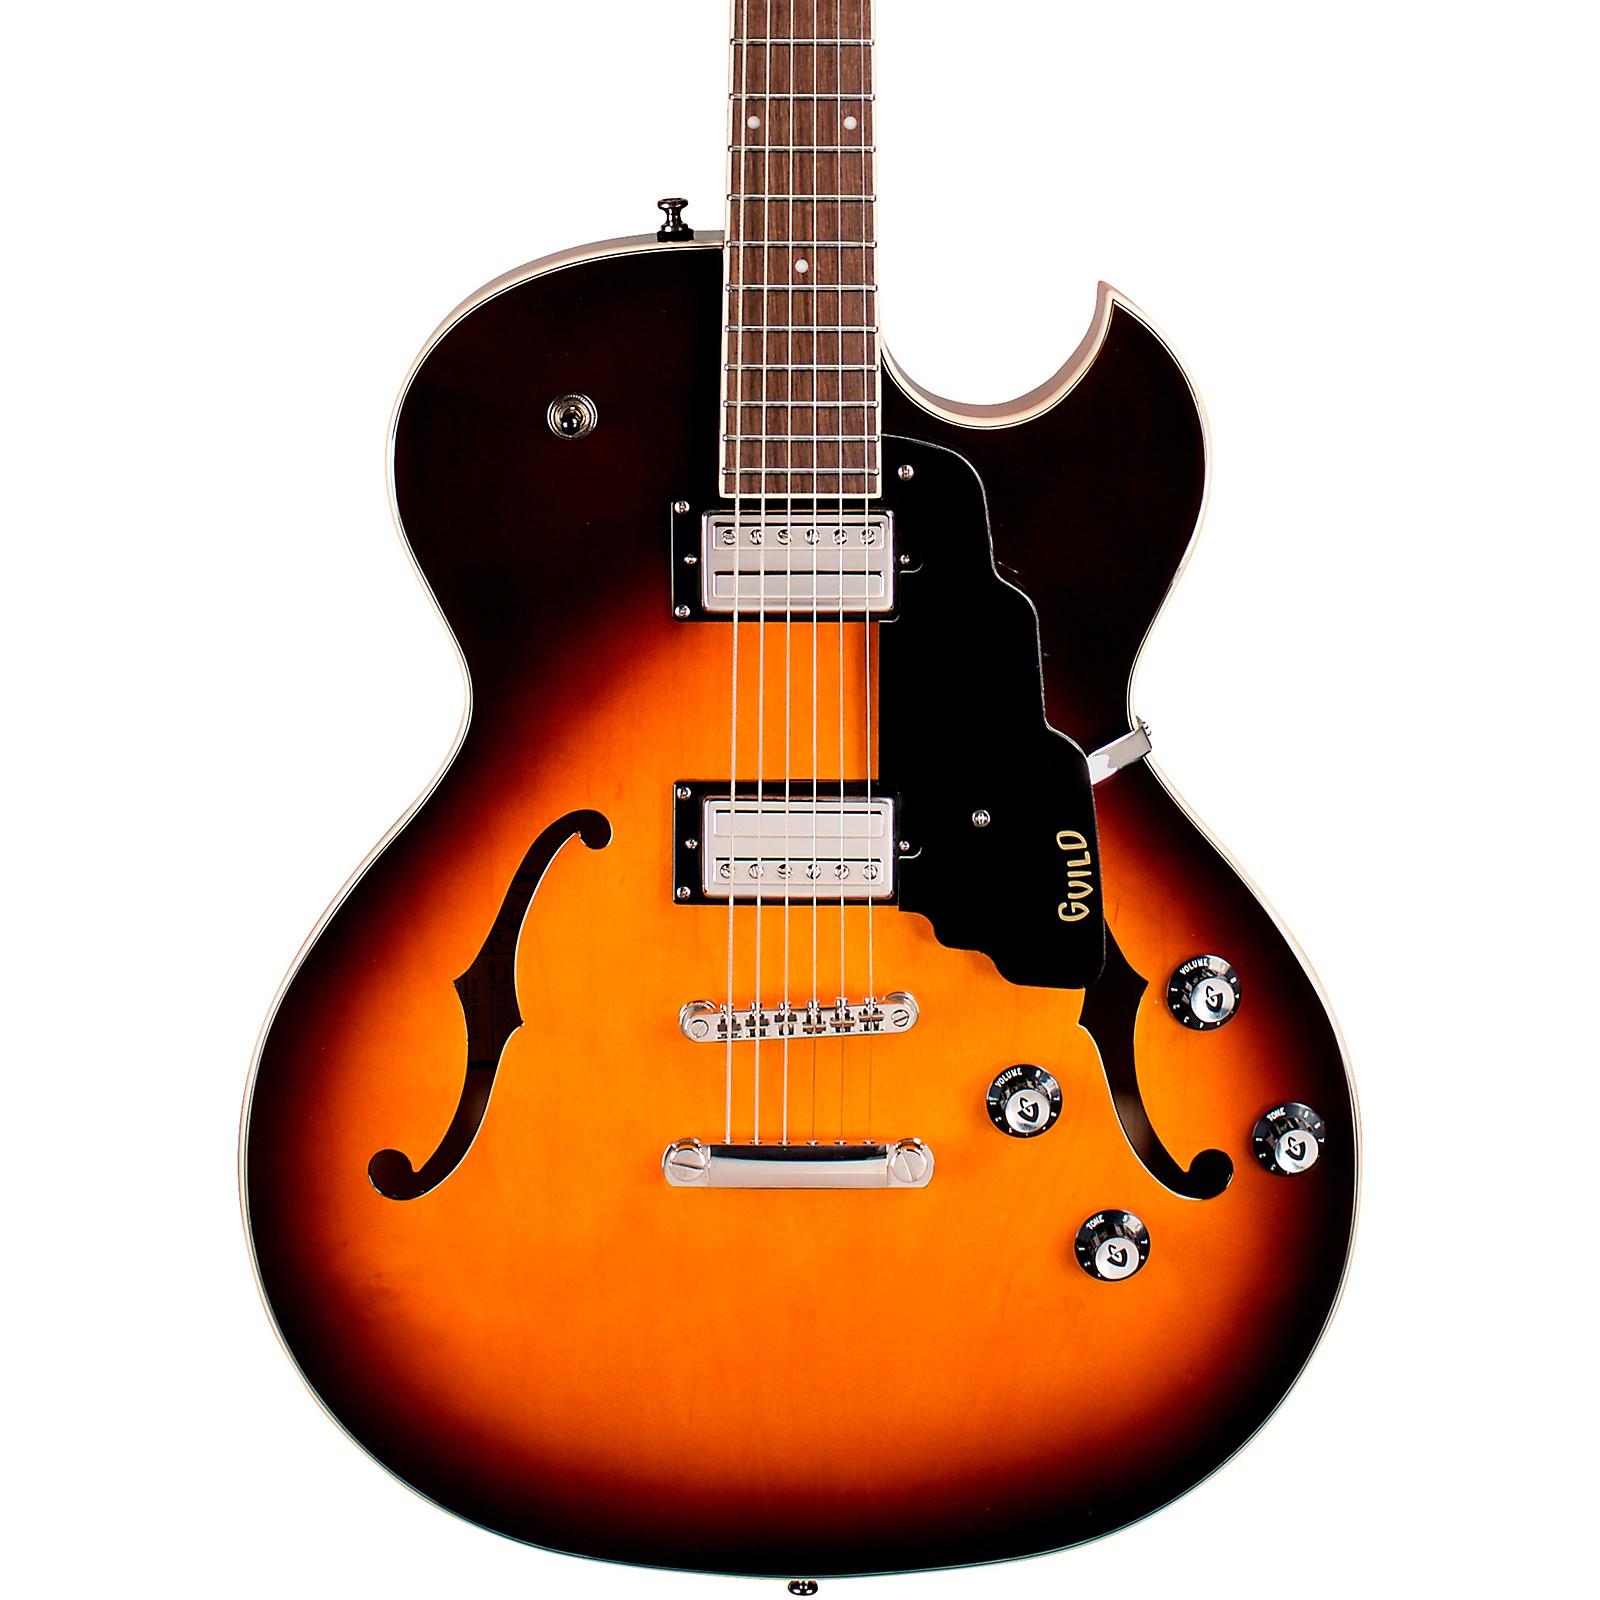 Guild Starfire I SC Semi-Hollow Electric Guitar